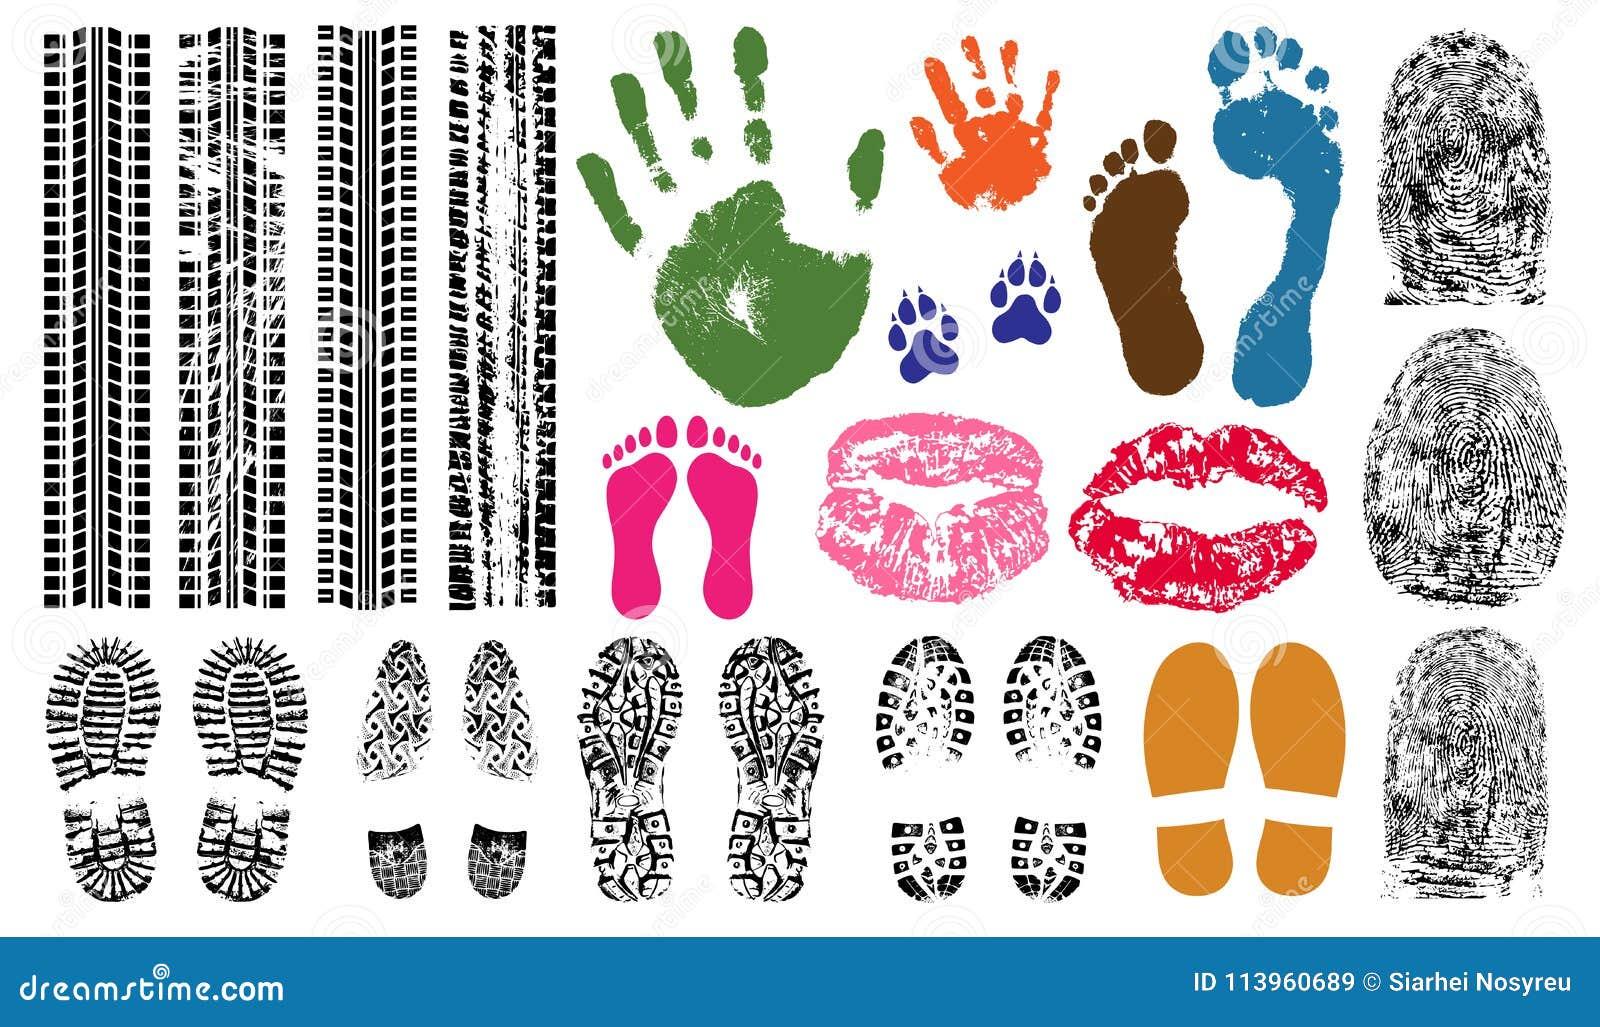 Handprint, ίχνος, δακτυλικό αποτύπωμα, τυπωμένη ύλη των χειλιών, διαδρομές ροδών Καθορισμένα στοιχεία συλλογής σφραγίδων